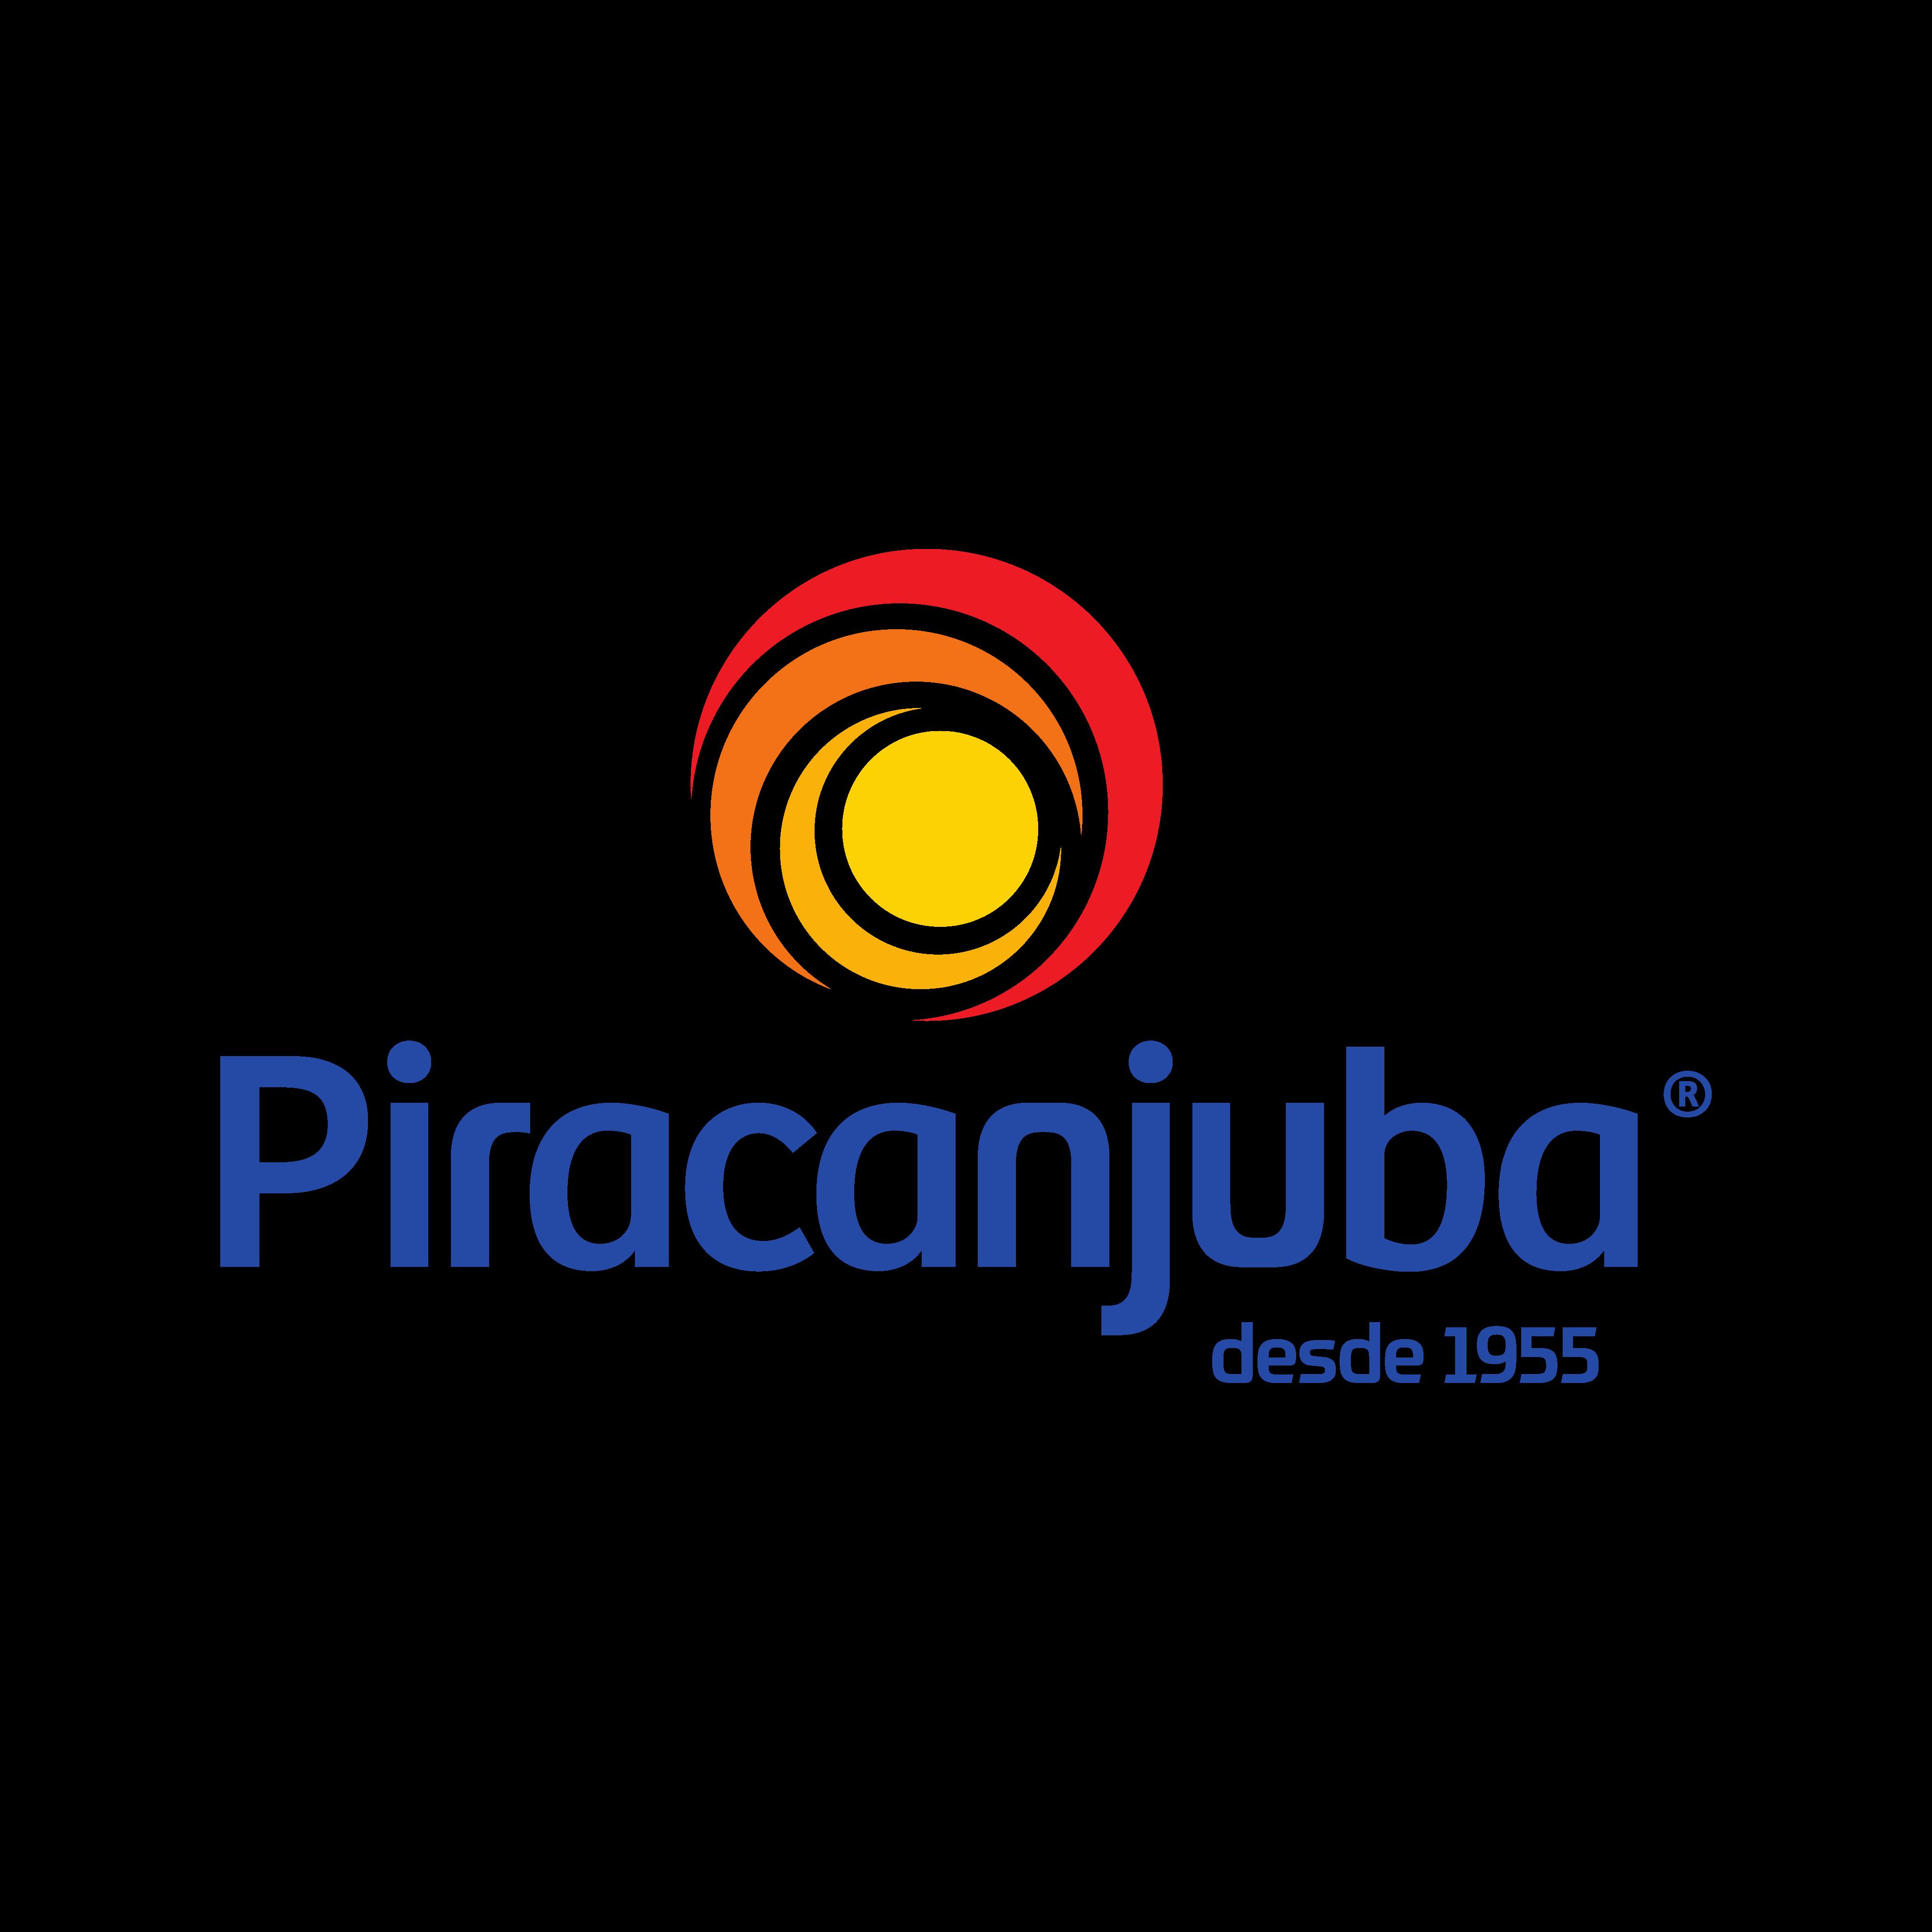 piracanjuba logo 0 - Piracanjuba Logo